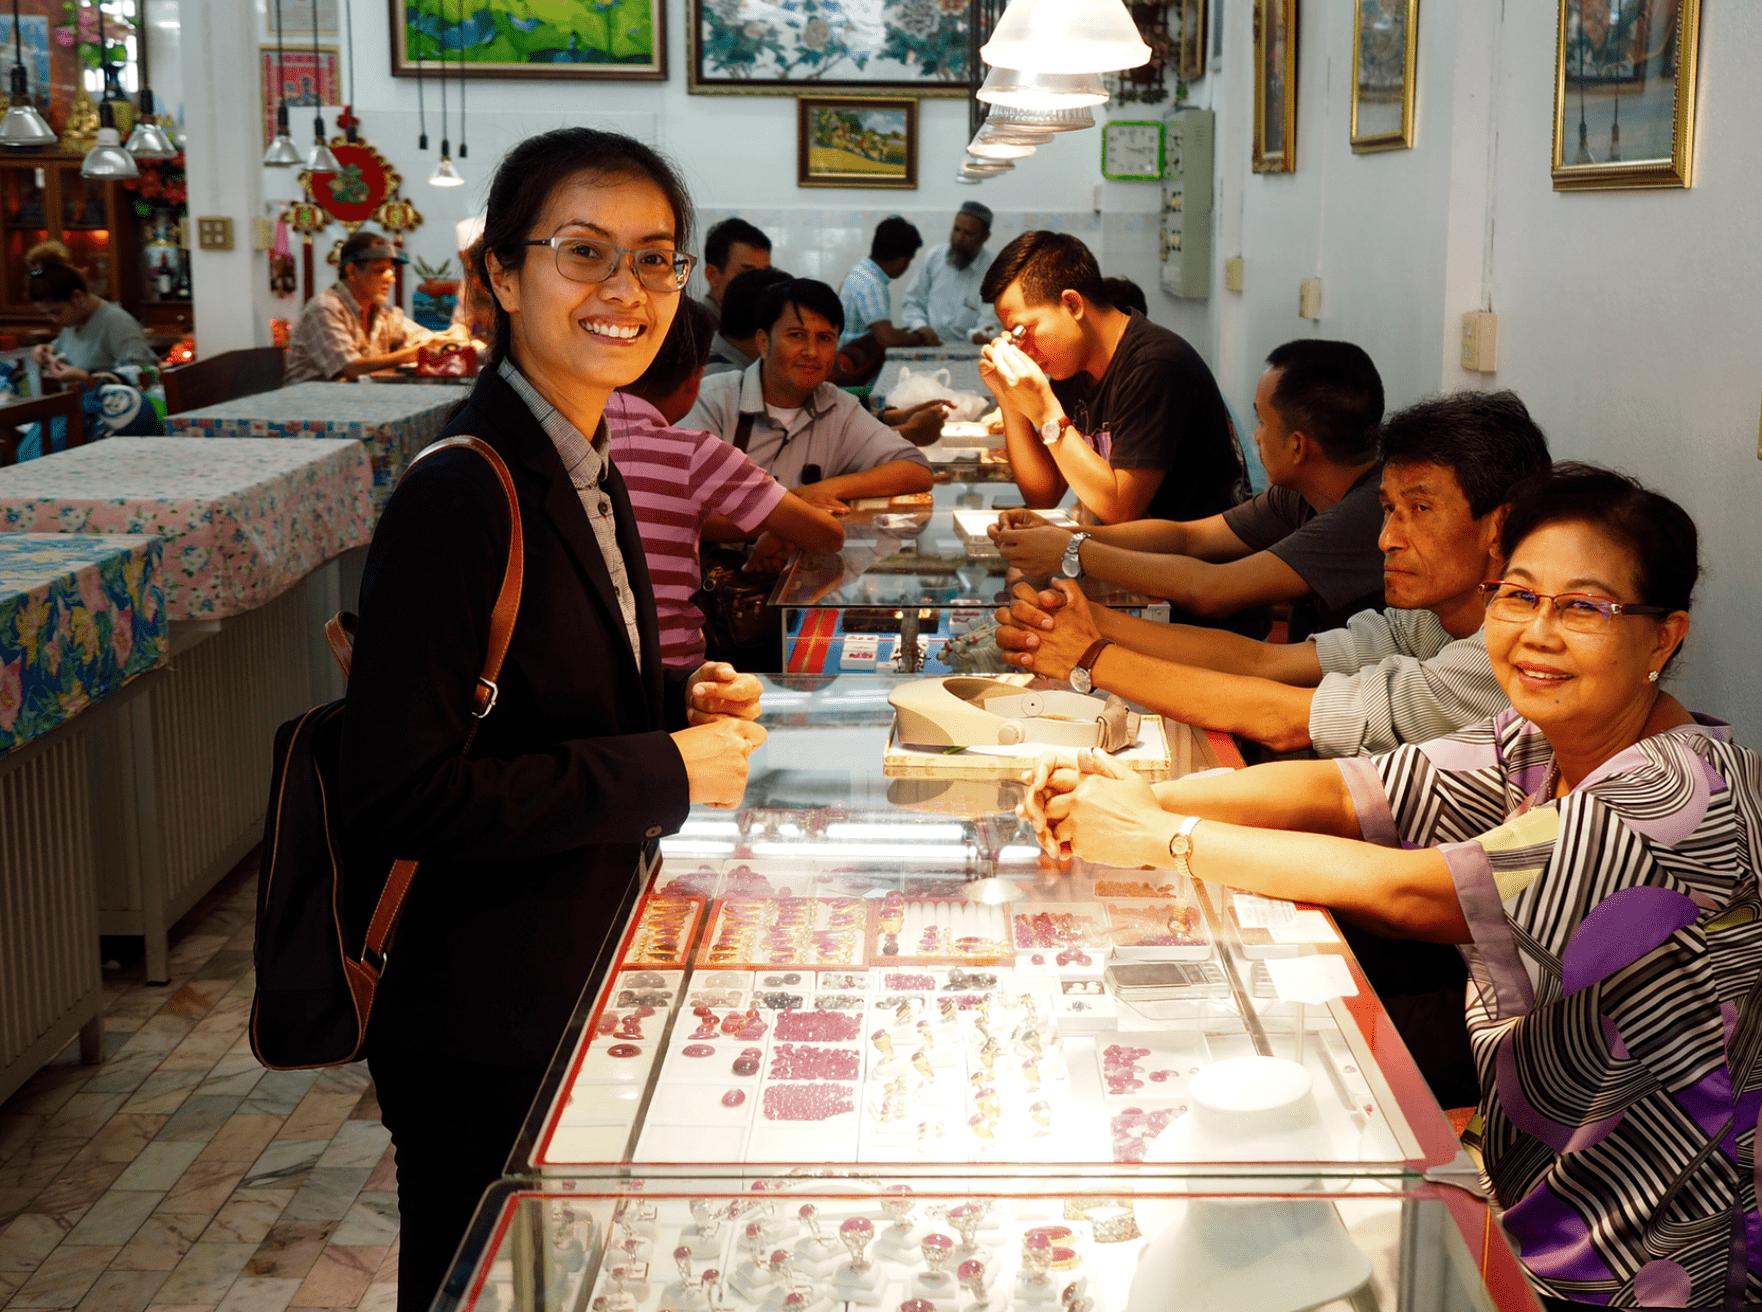 Nadthasiri Bergman, LL.M., interviews Khun Hathairat Pendee, Mogok gem trader